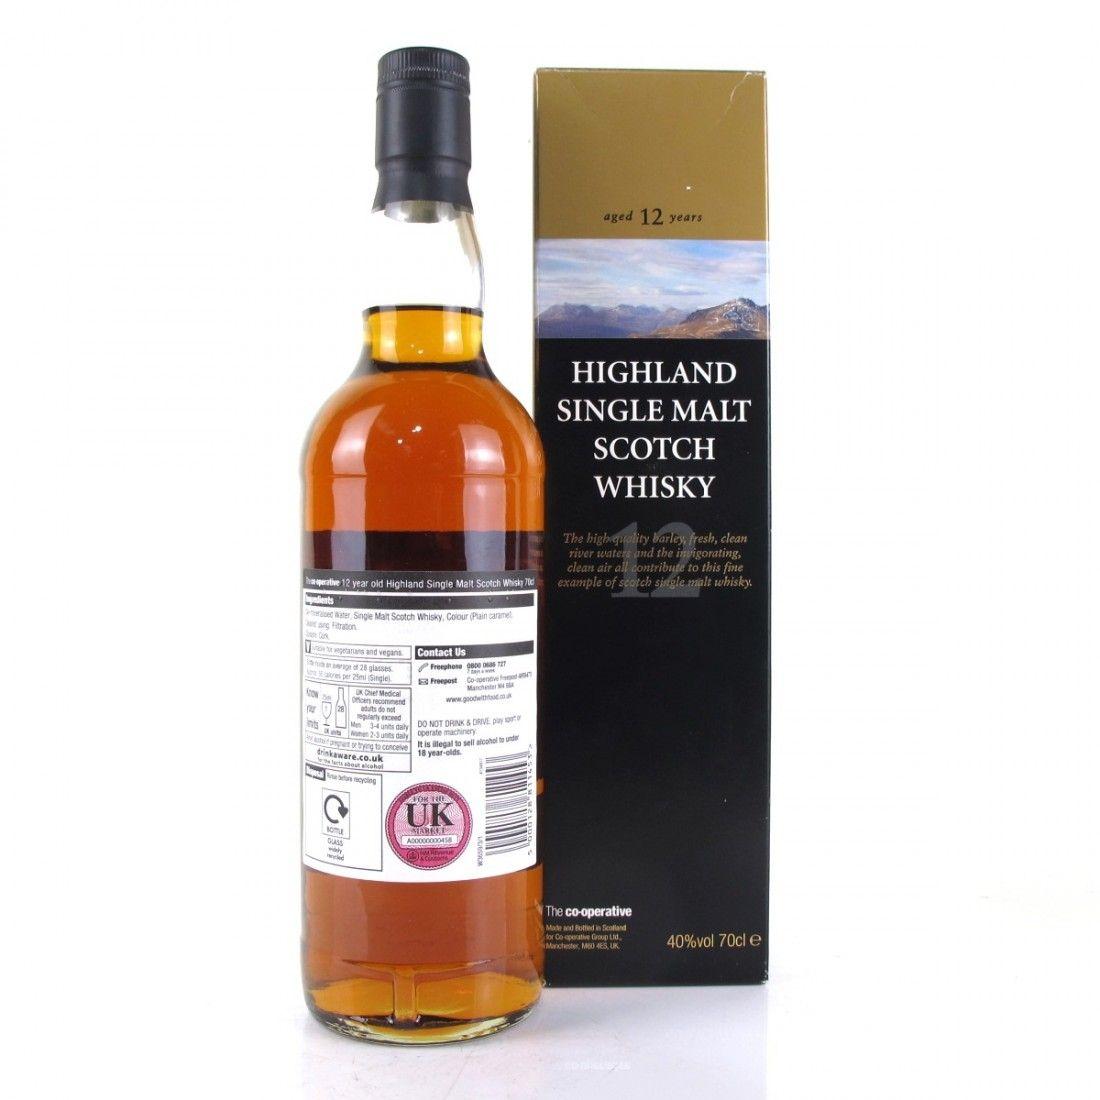 Co-op 12 year old Highland single malt £20